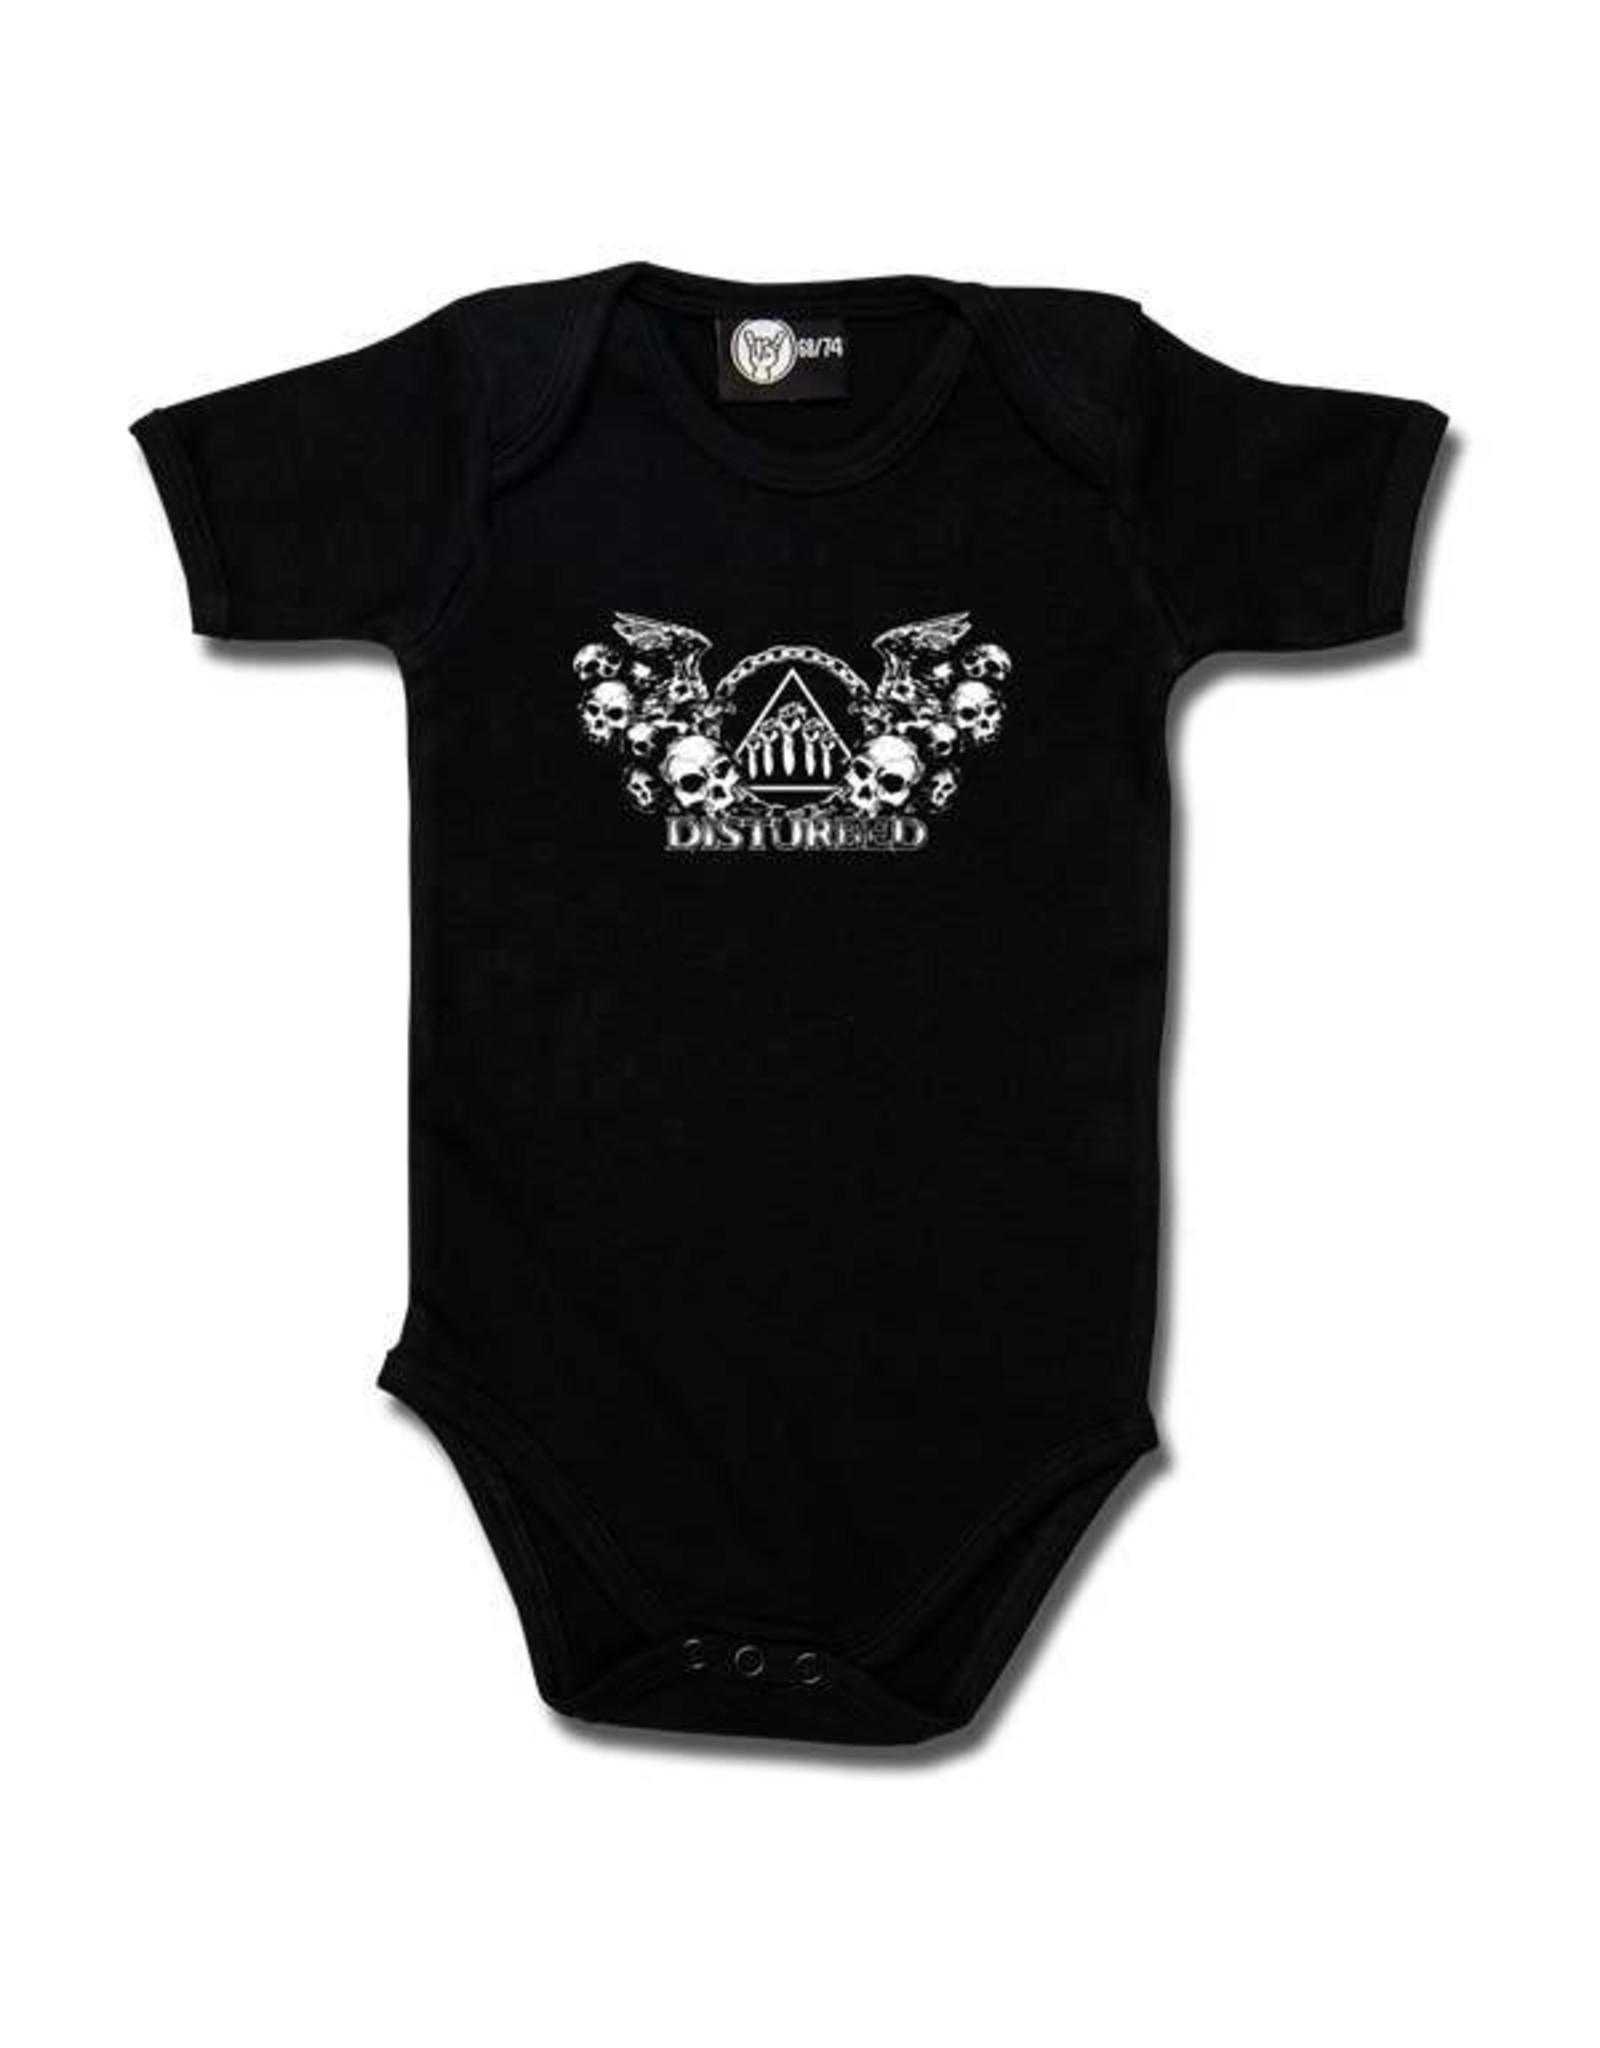 Disturbed (Logo) - Baby Body